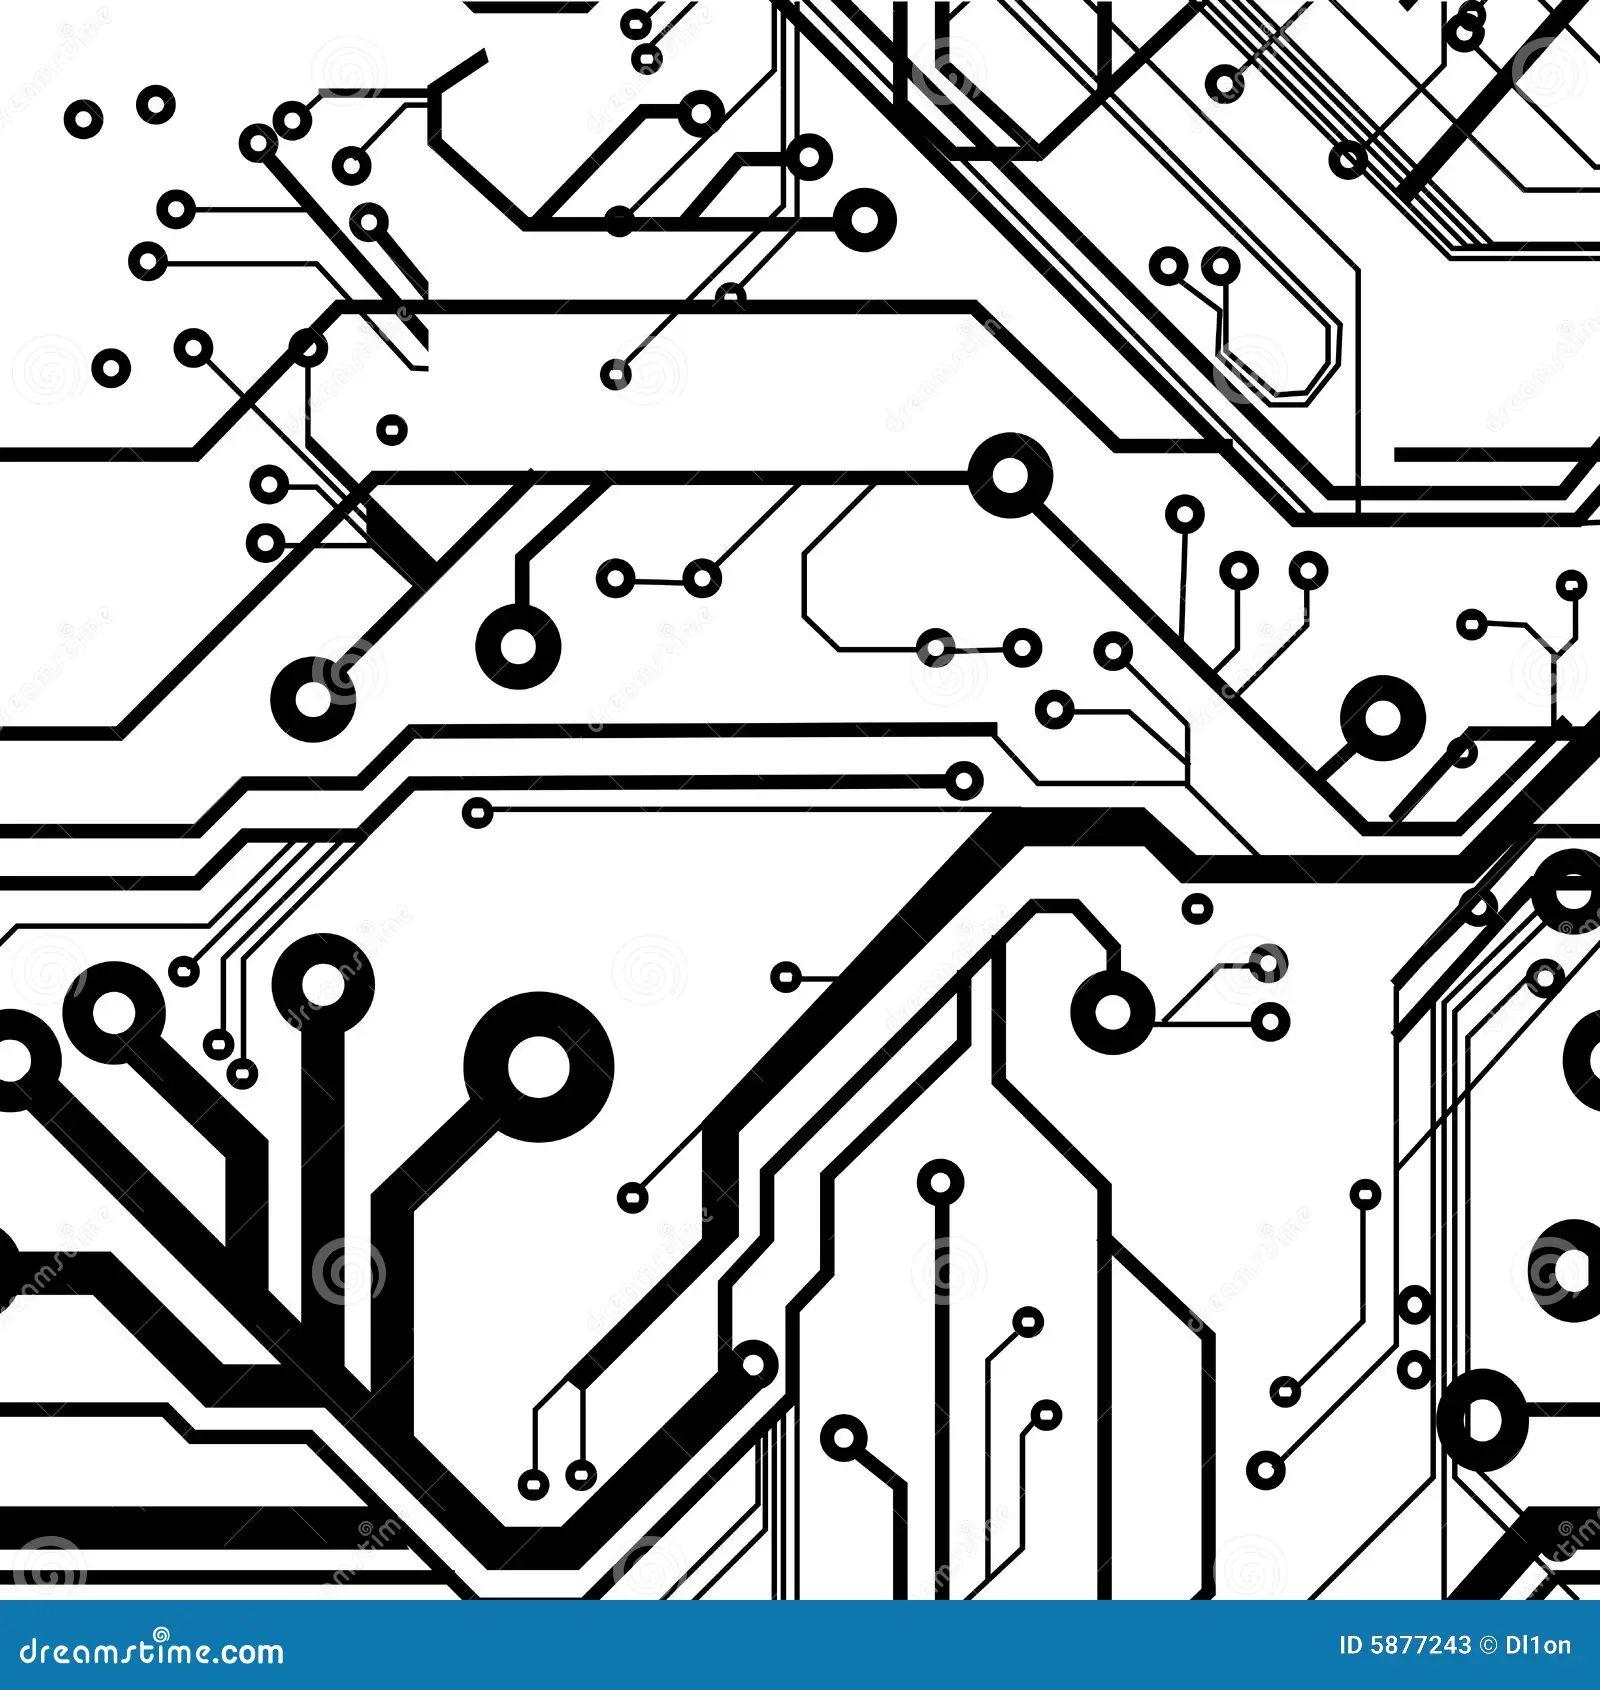 printed circuitboard stock images image 11739244